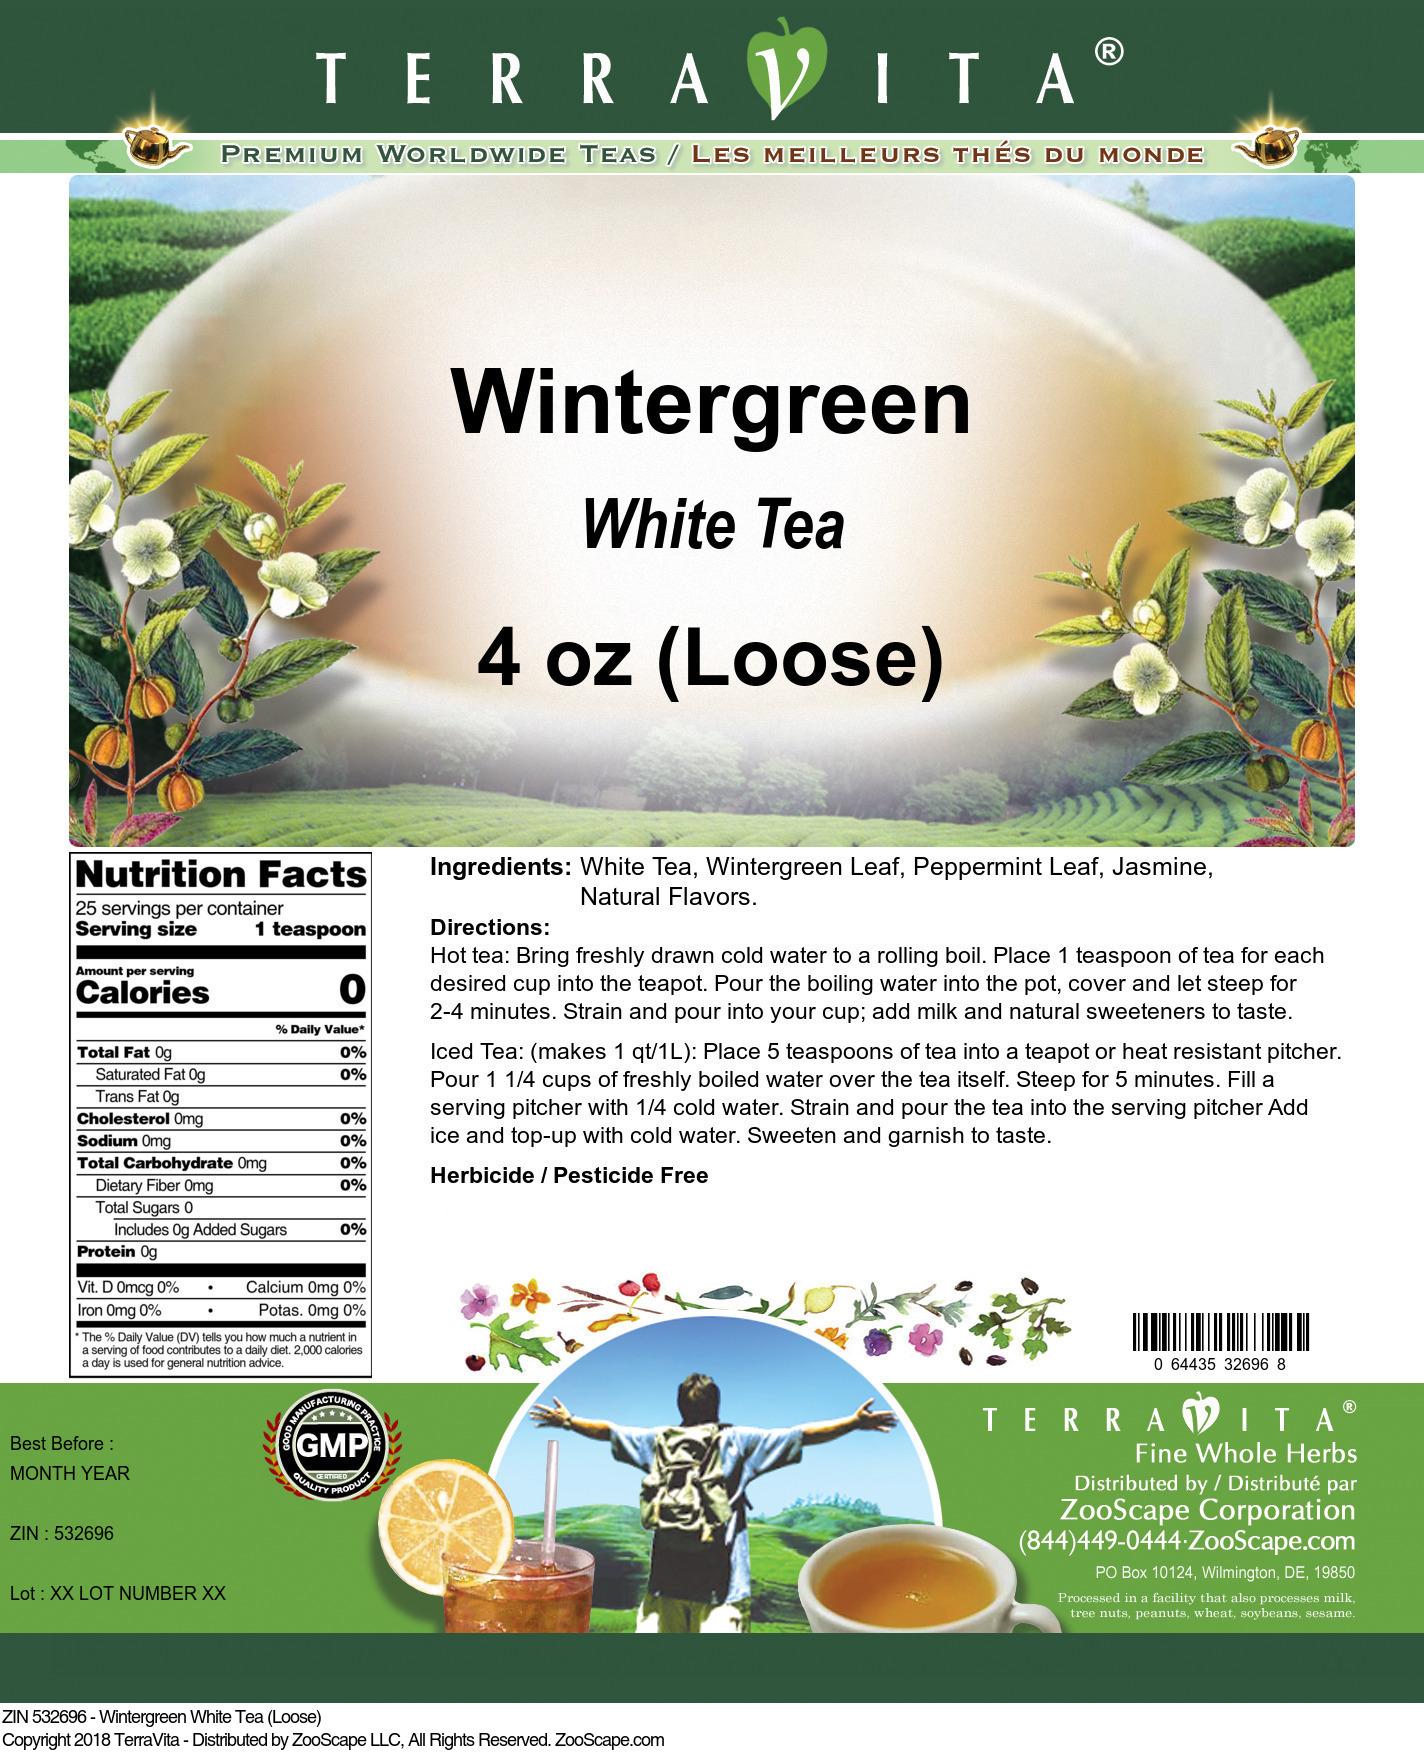 Wintergreen White Tea (Loose)